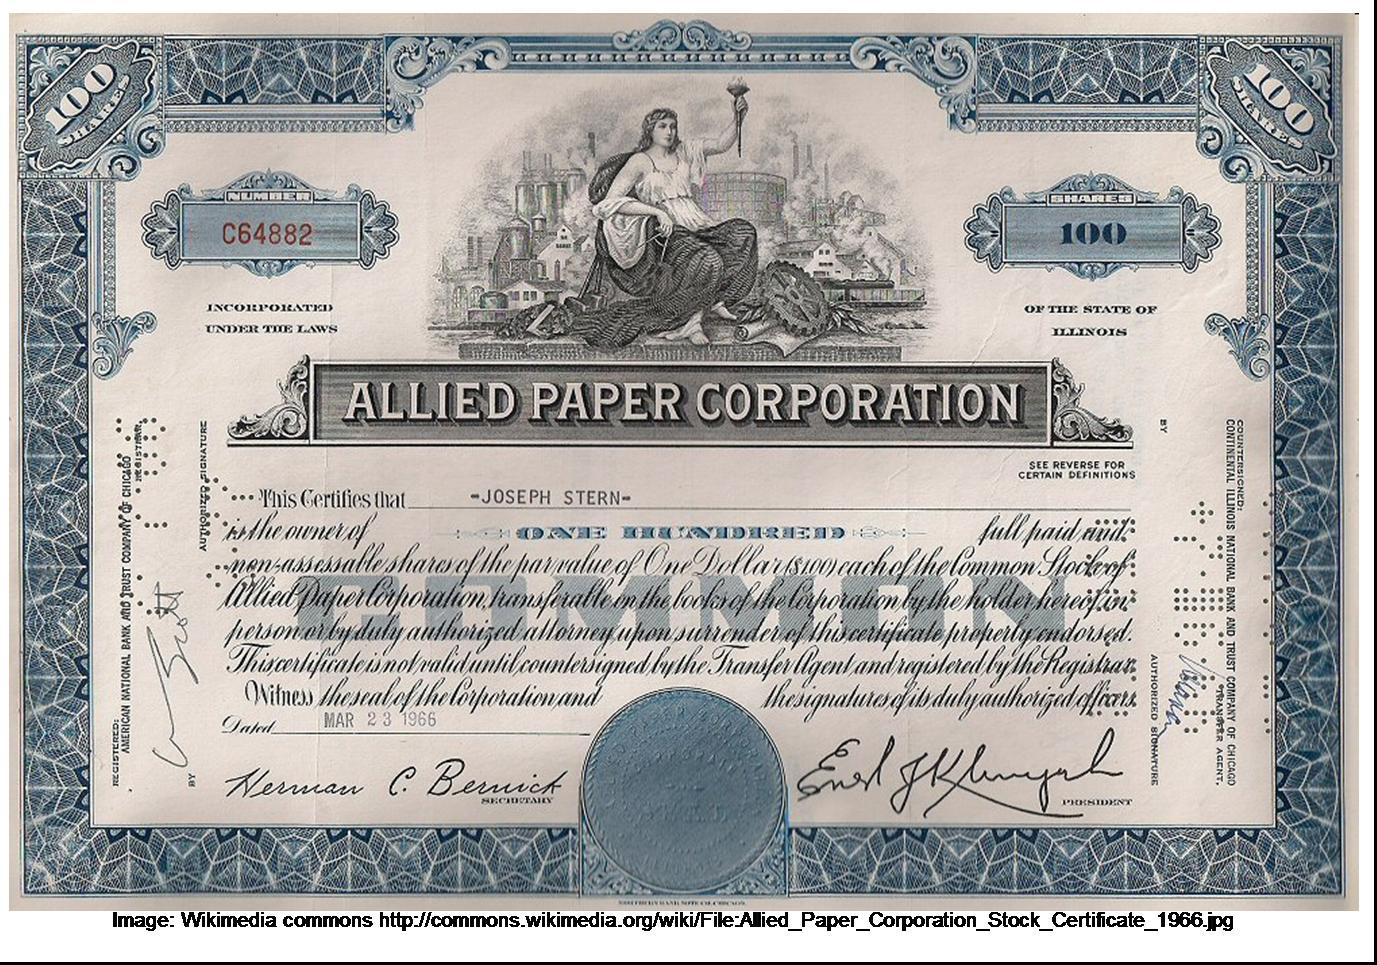 Stock certificate template disney stock certificate template stock certificate template yelopaper Gallery